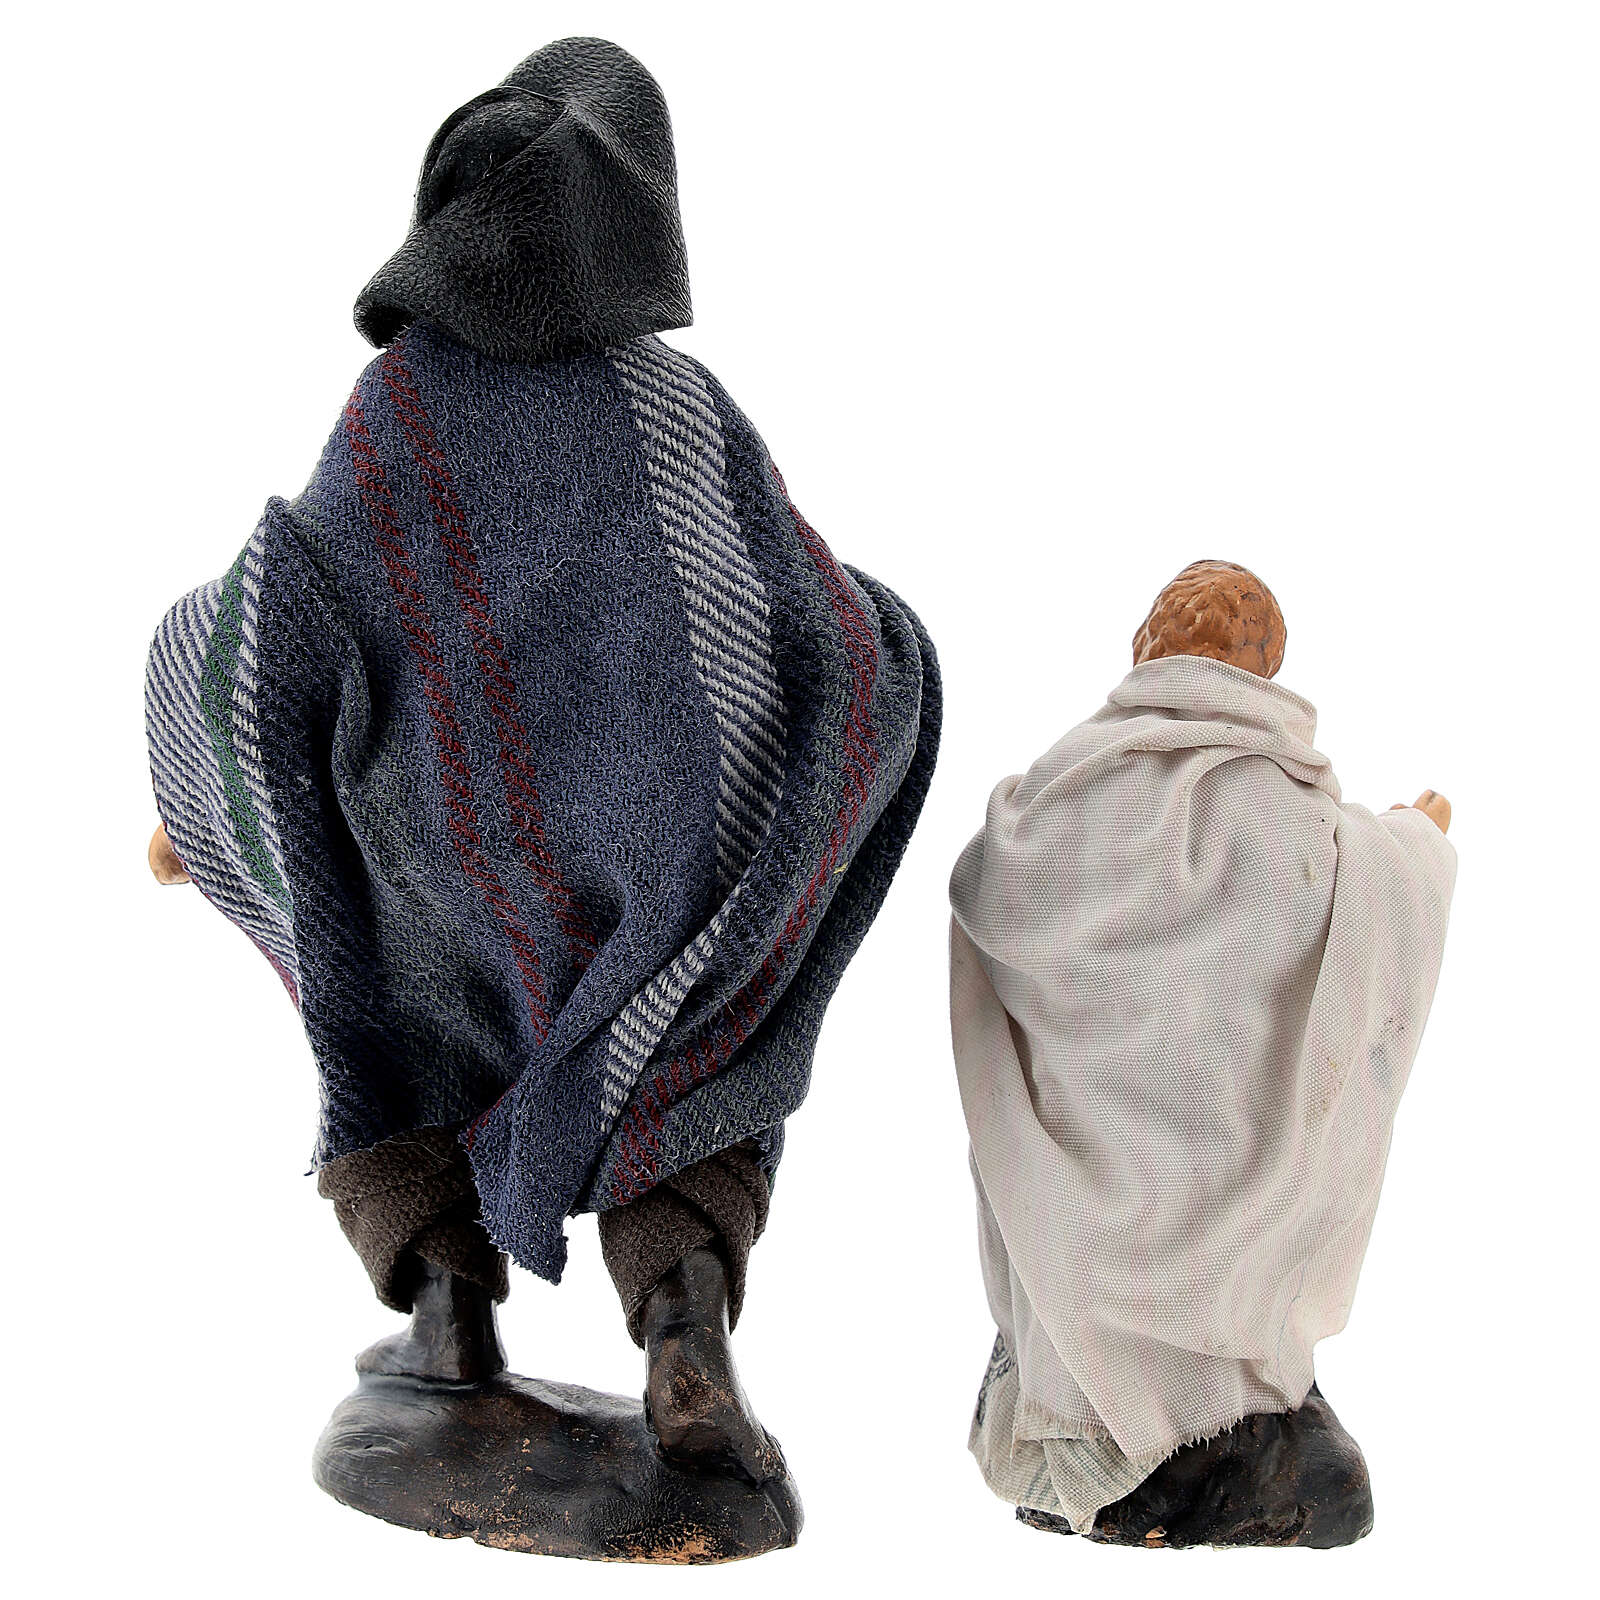 Uomo con bambino 12 cm presepe napoletano terracotta 4